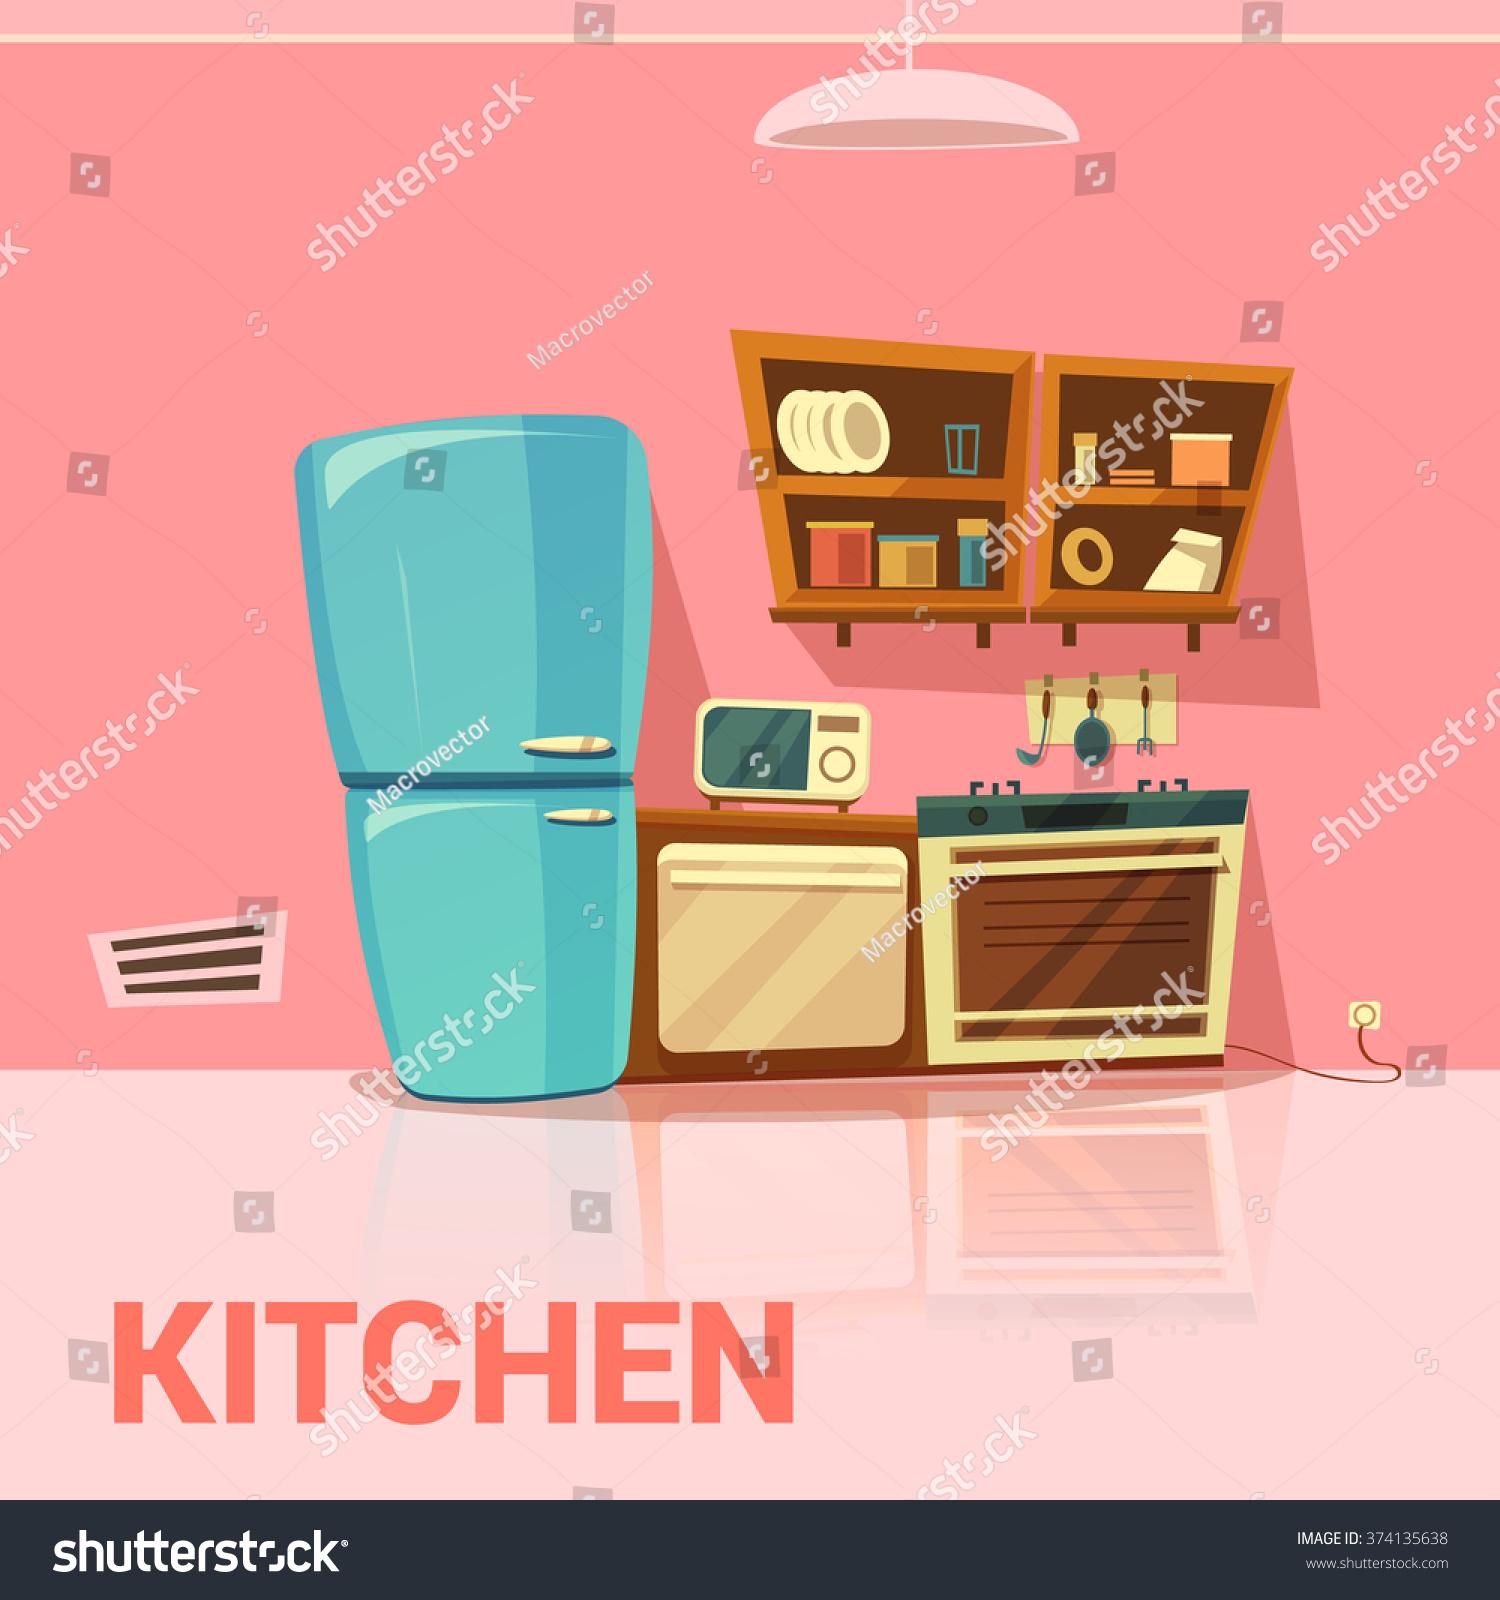 Retro Kitchen Illustration: Kitchen Retro Design Fridge Microwave Oven Stock Vector 374135638